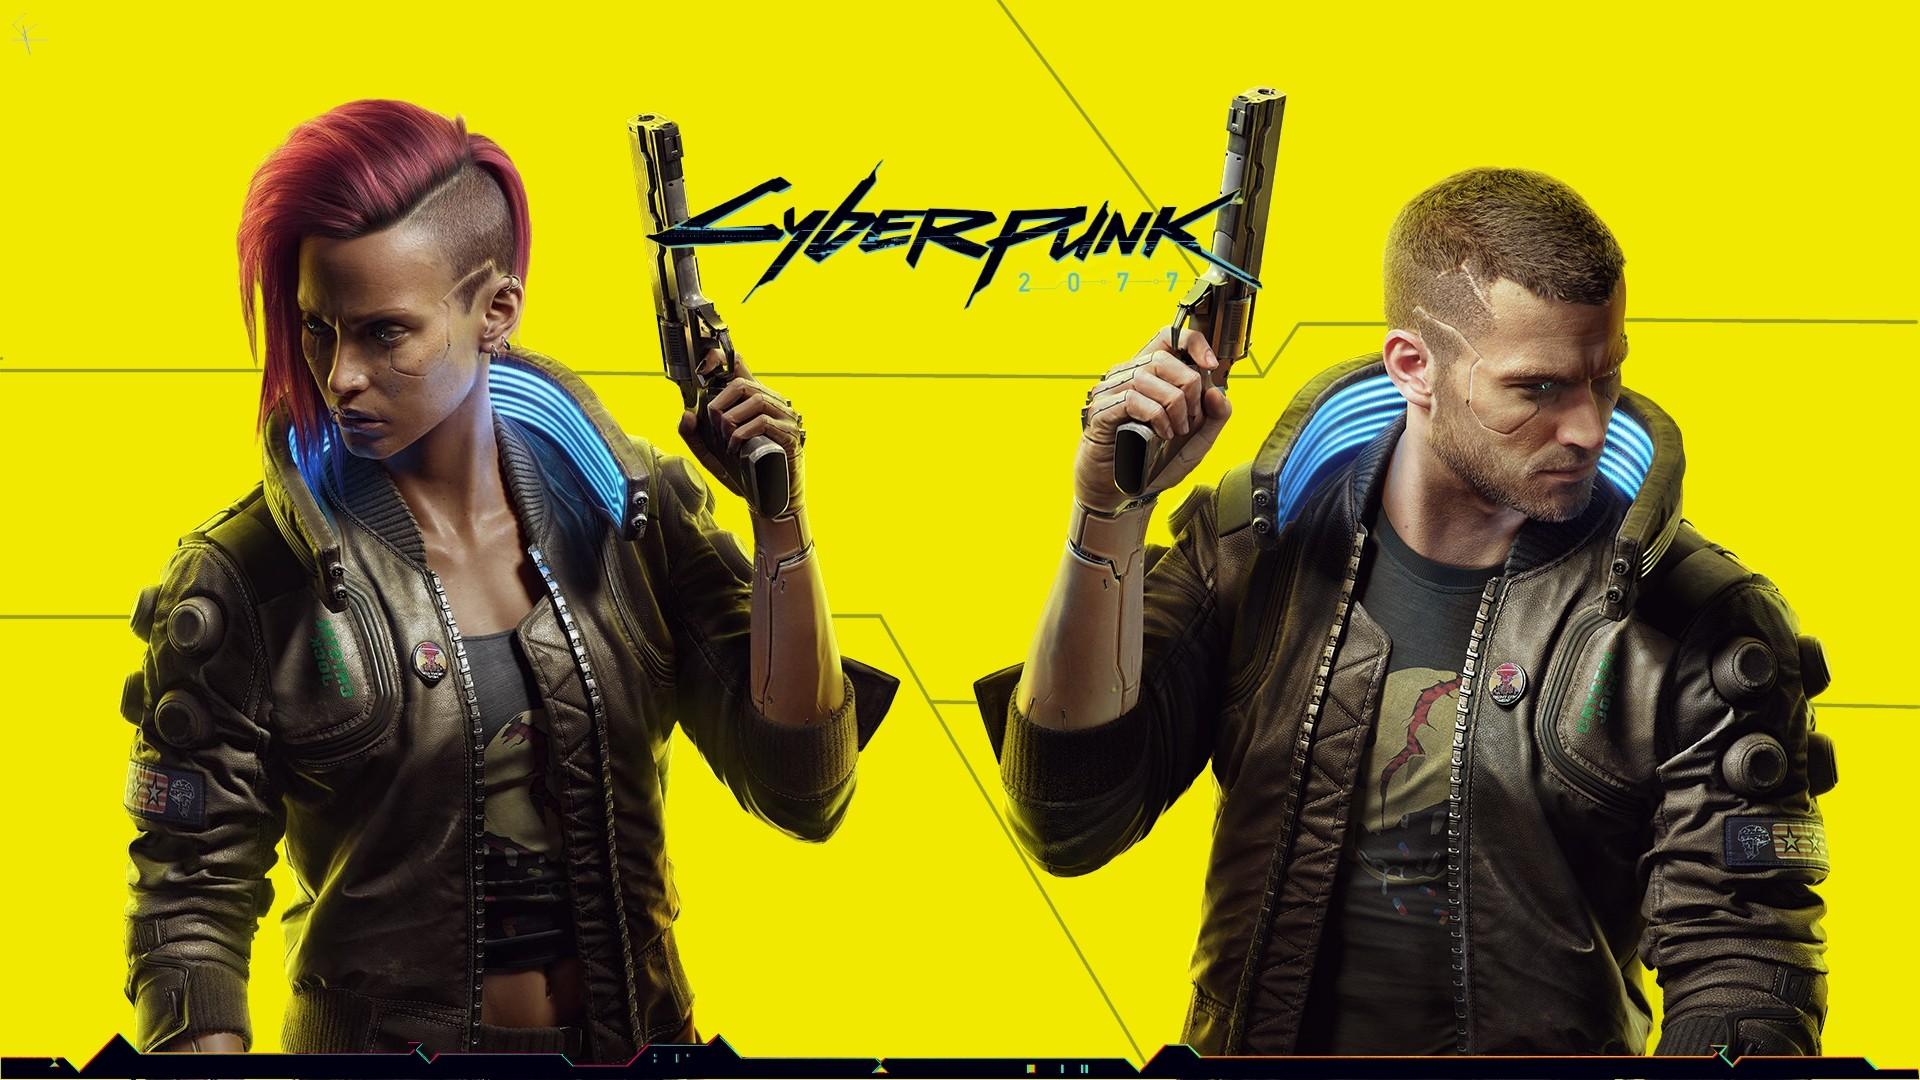 Cyberpunk 2077 Poster Background